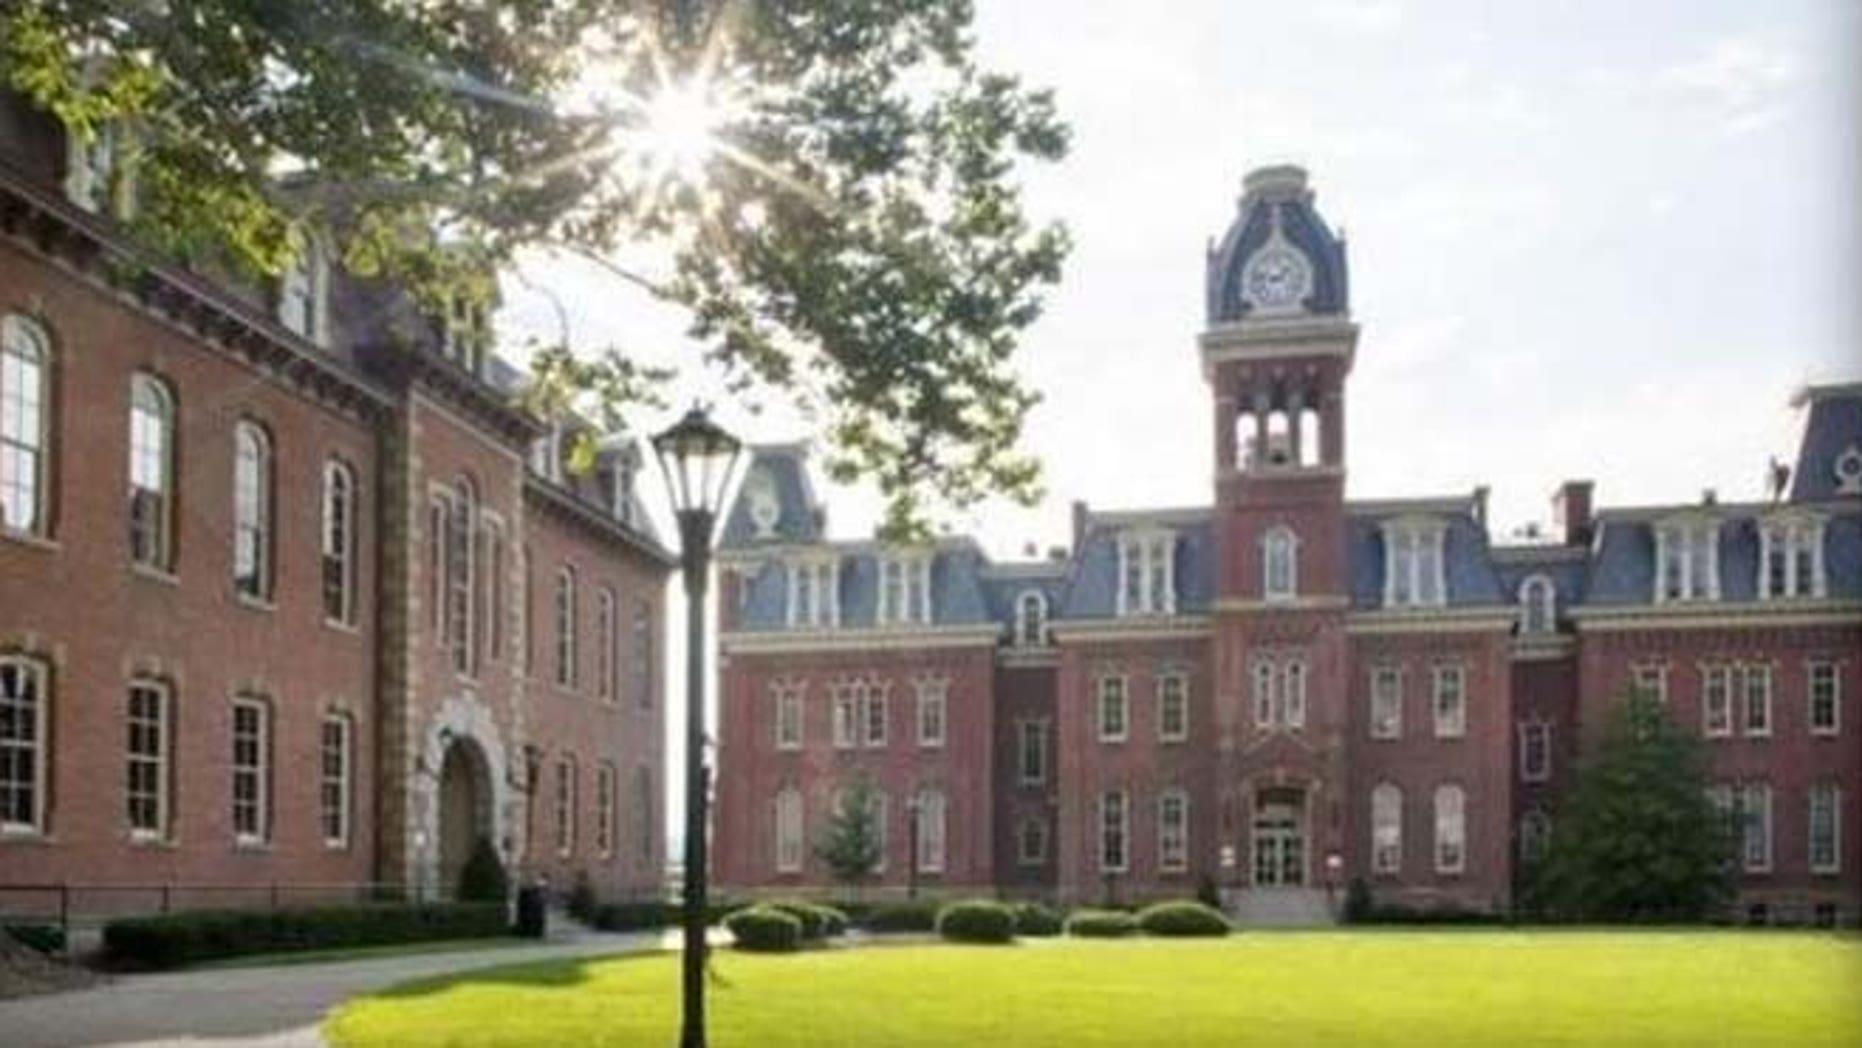 West Virginia University's campus in Morgantown.